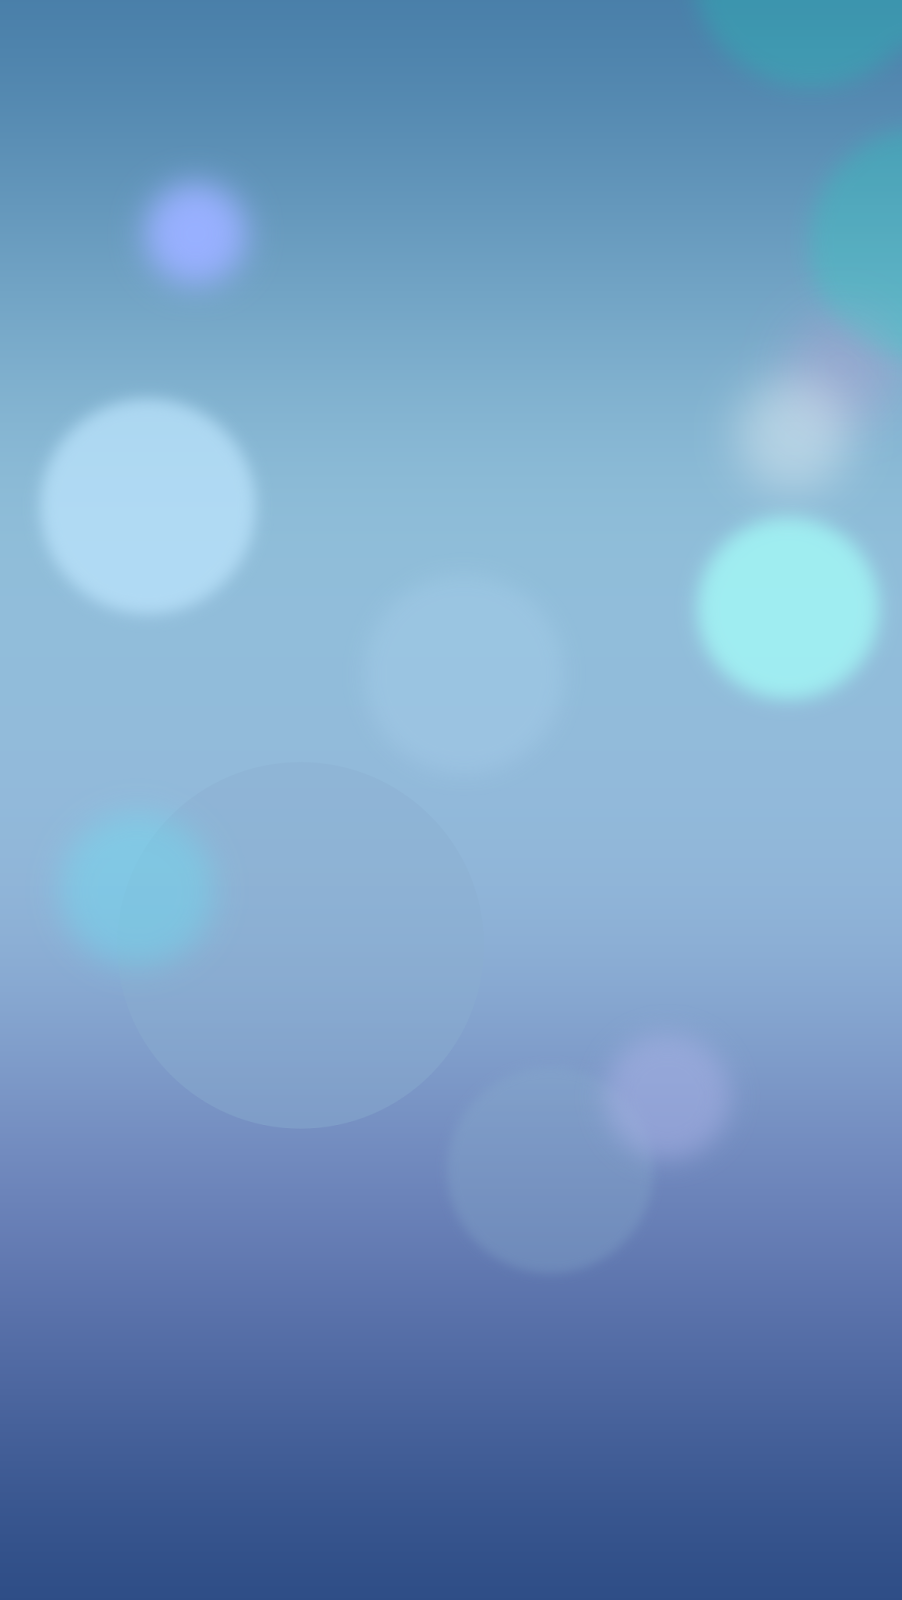 iOS 7 iPad Retina Wallpapers iPad Retina HD Wallpapers 902x1600